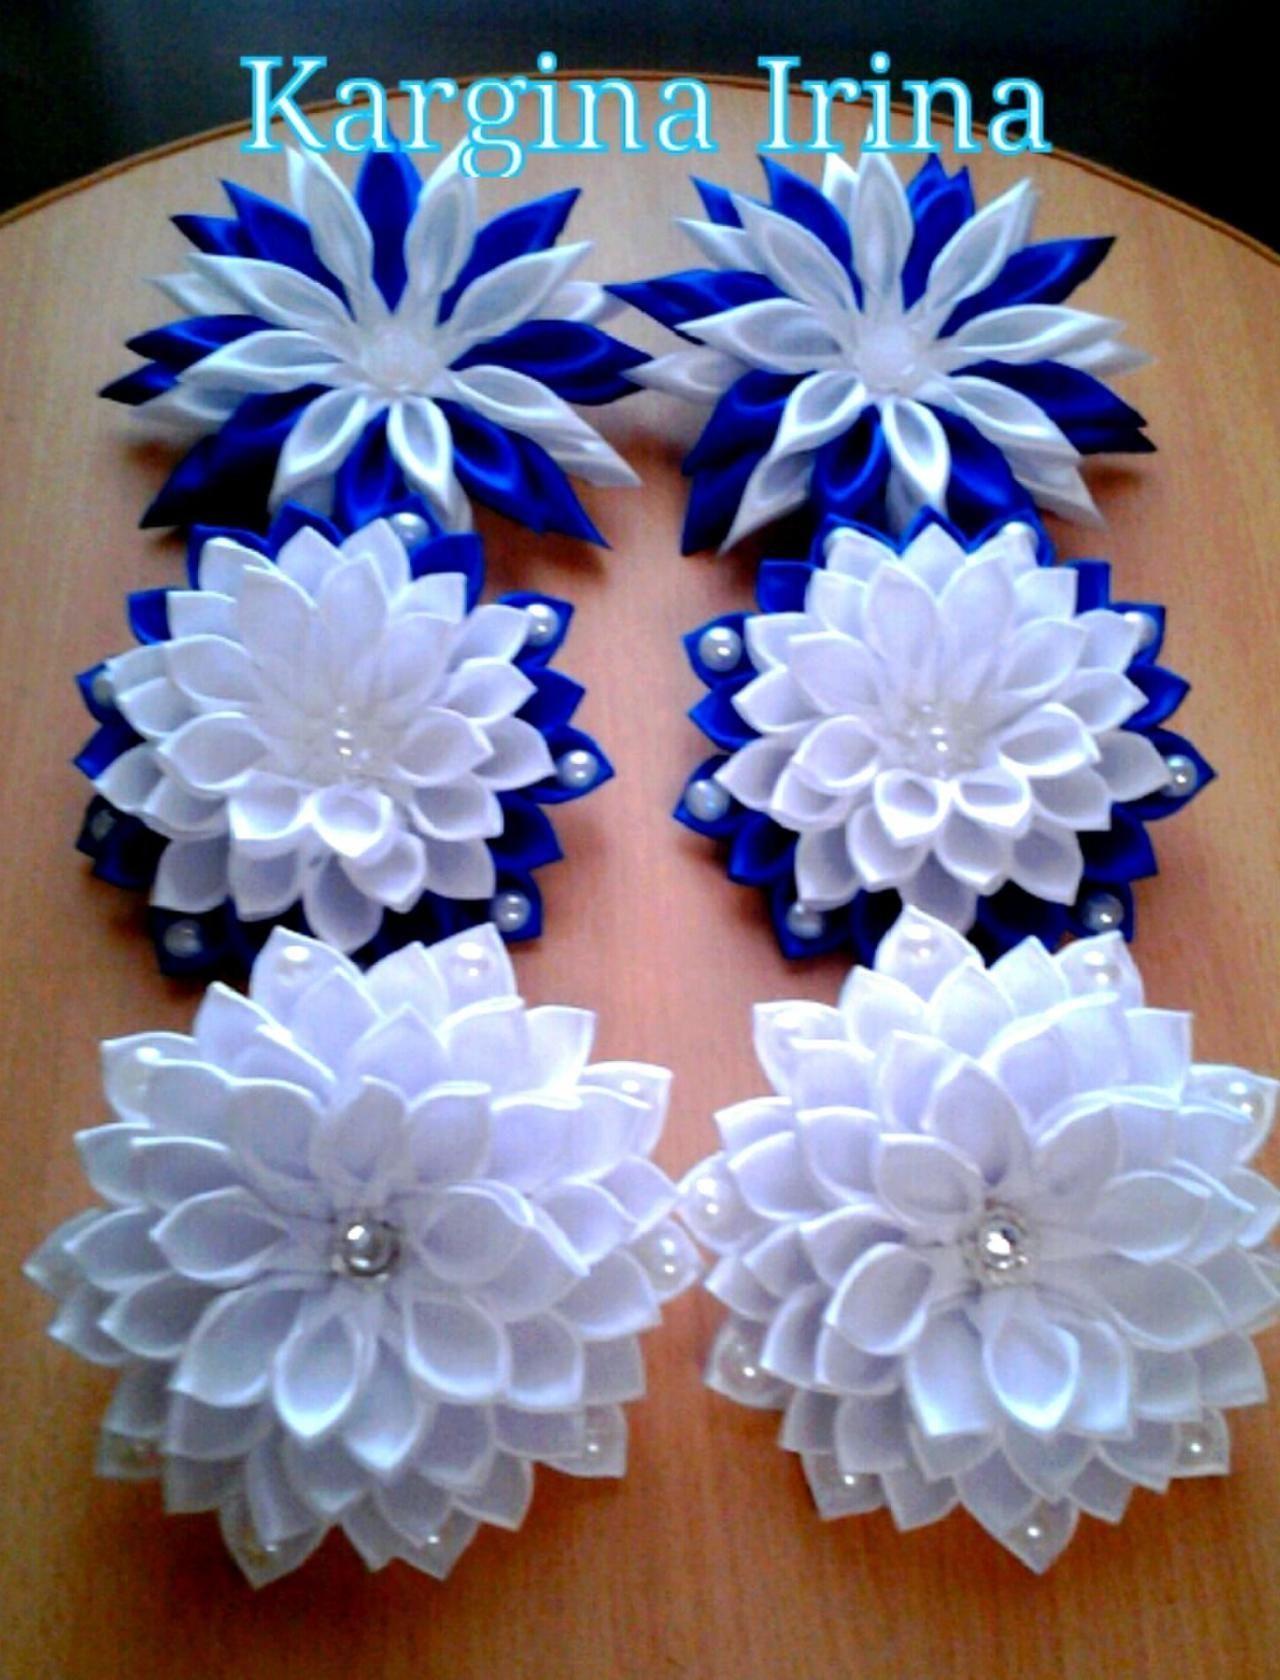 Я вам помогу!Все о Канзаши. Все МК на mamakuban.ru | OK.RU - MyKingList.com #ribbonflower